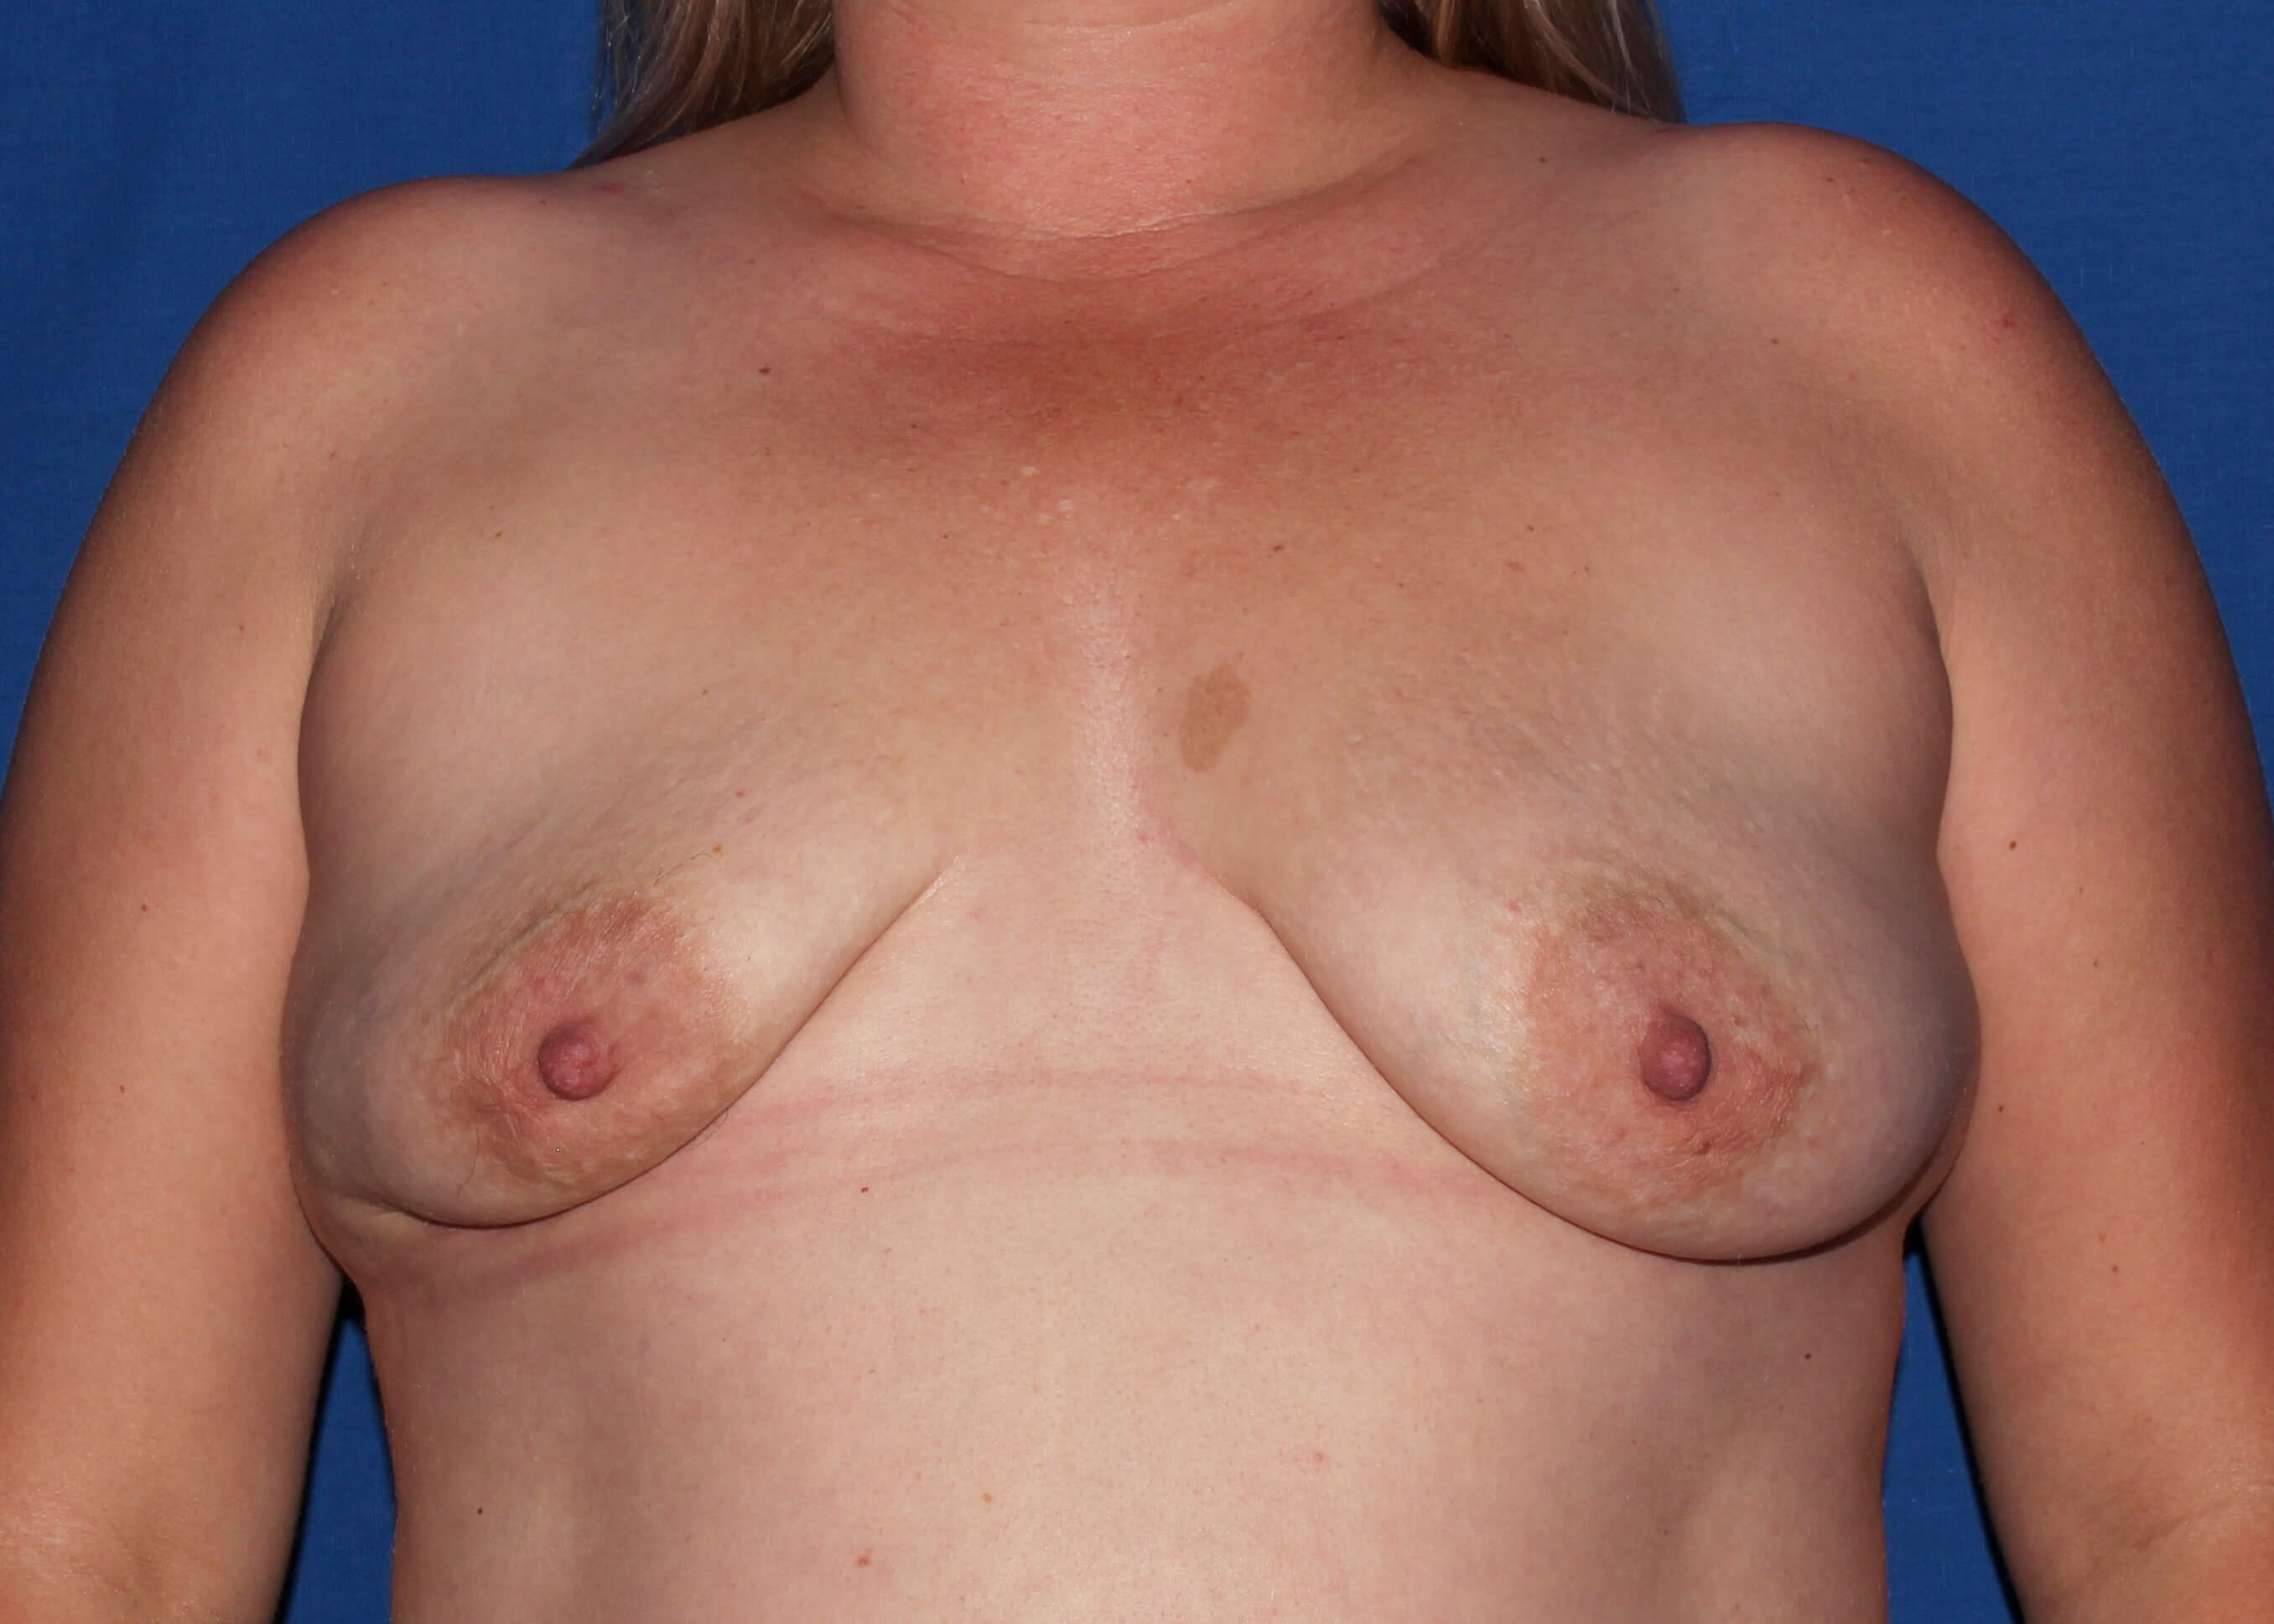 before breast augmentation - Breast Augmentation